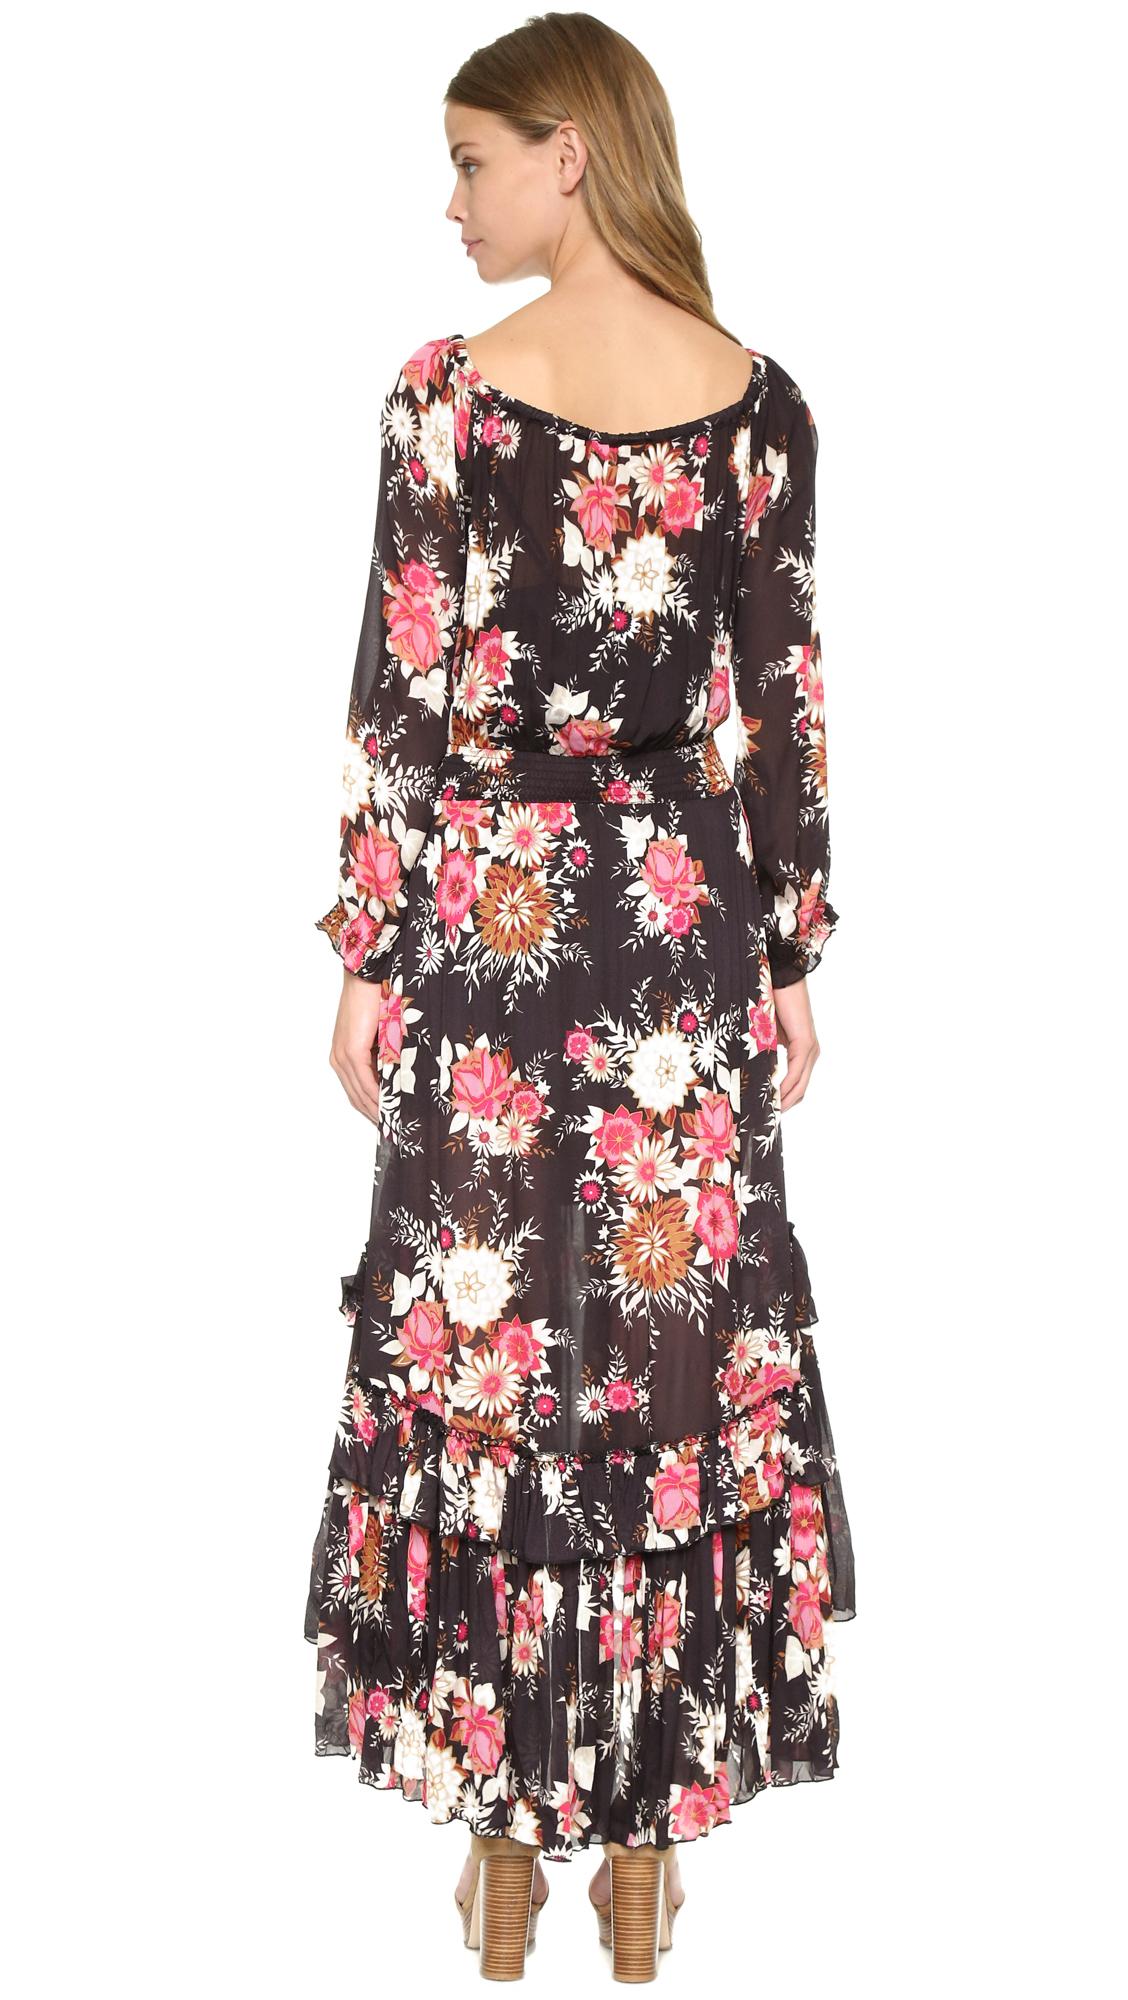 Plus Size Summer Dresses Walmart